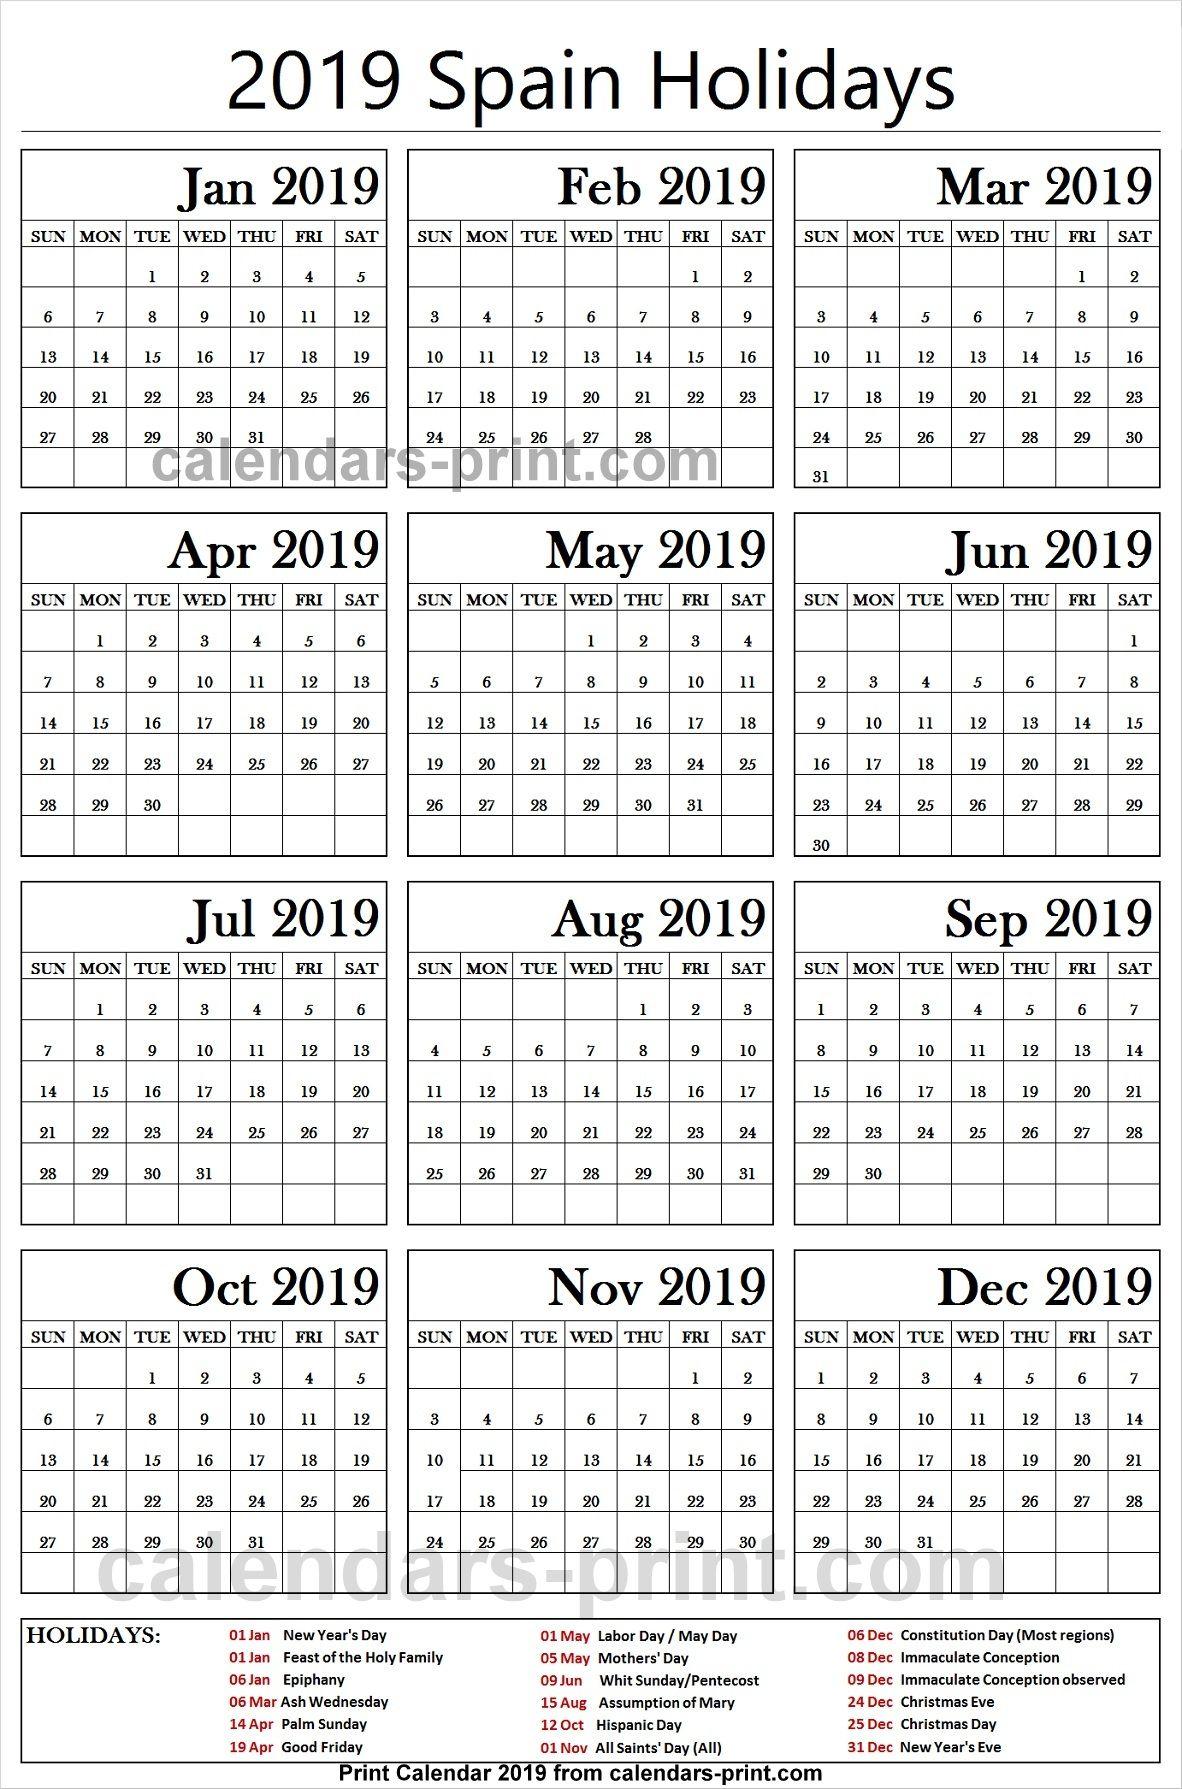 2019 Bank Holidays Spain Holiday Calendar Calendar Template